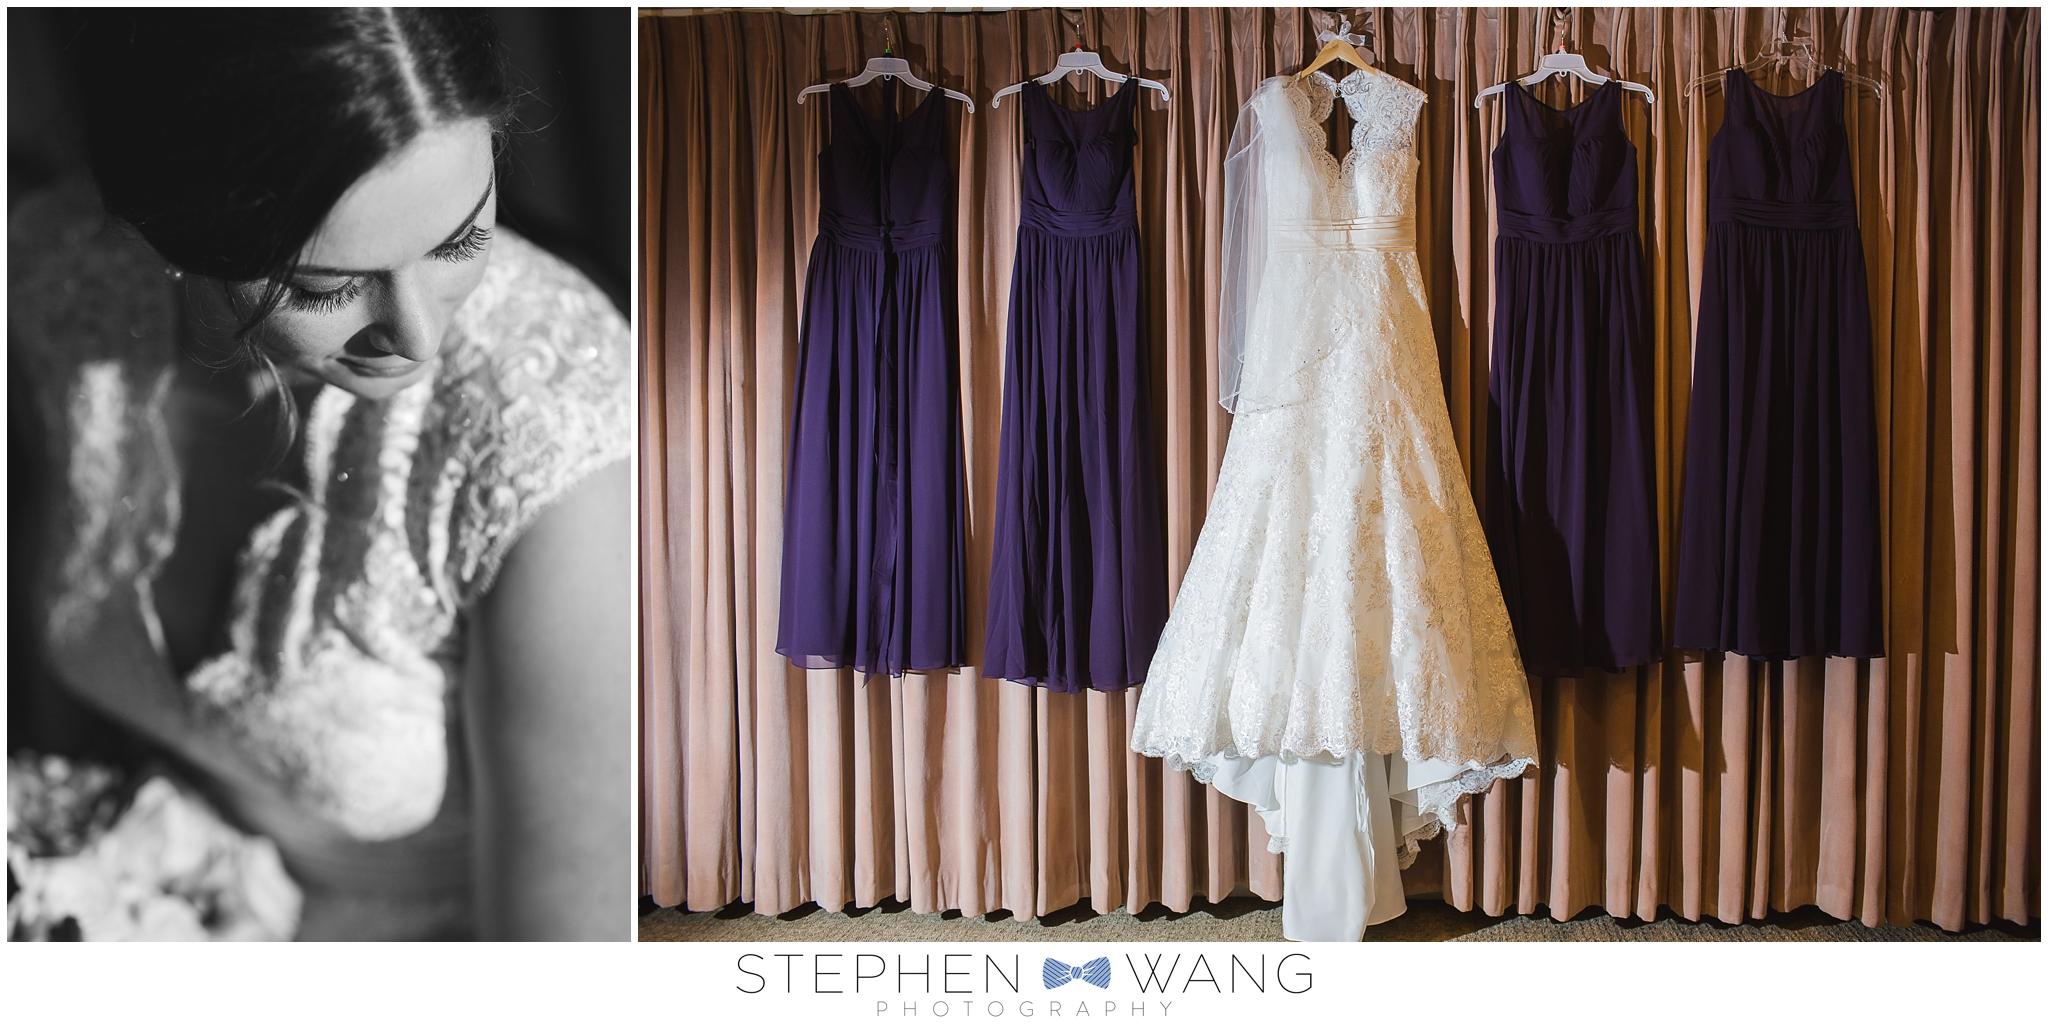 Stephen Wang Photography Wedding Photographer Connecticut CT-12-24_0013.jpg